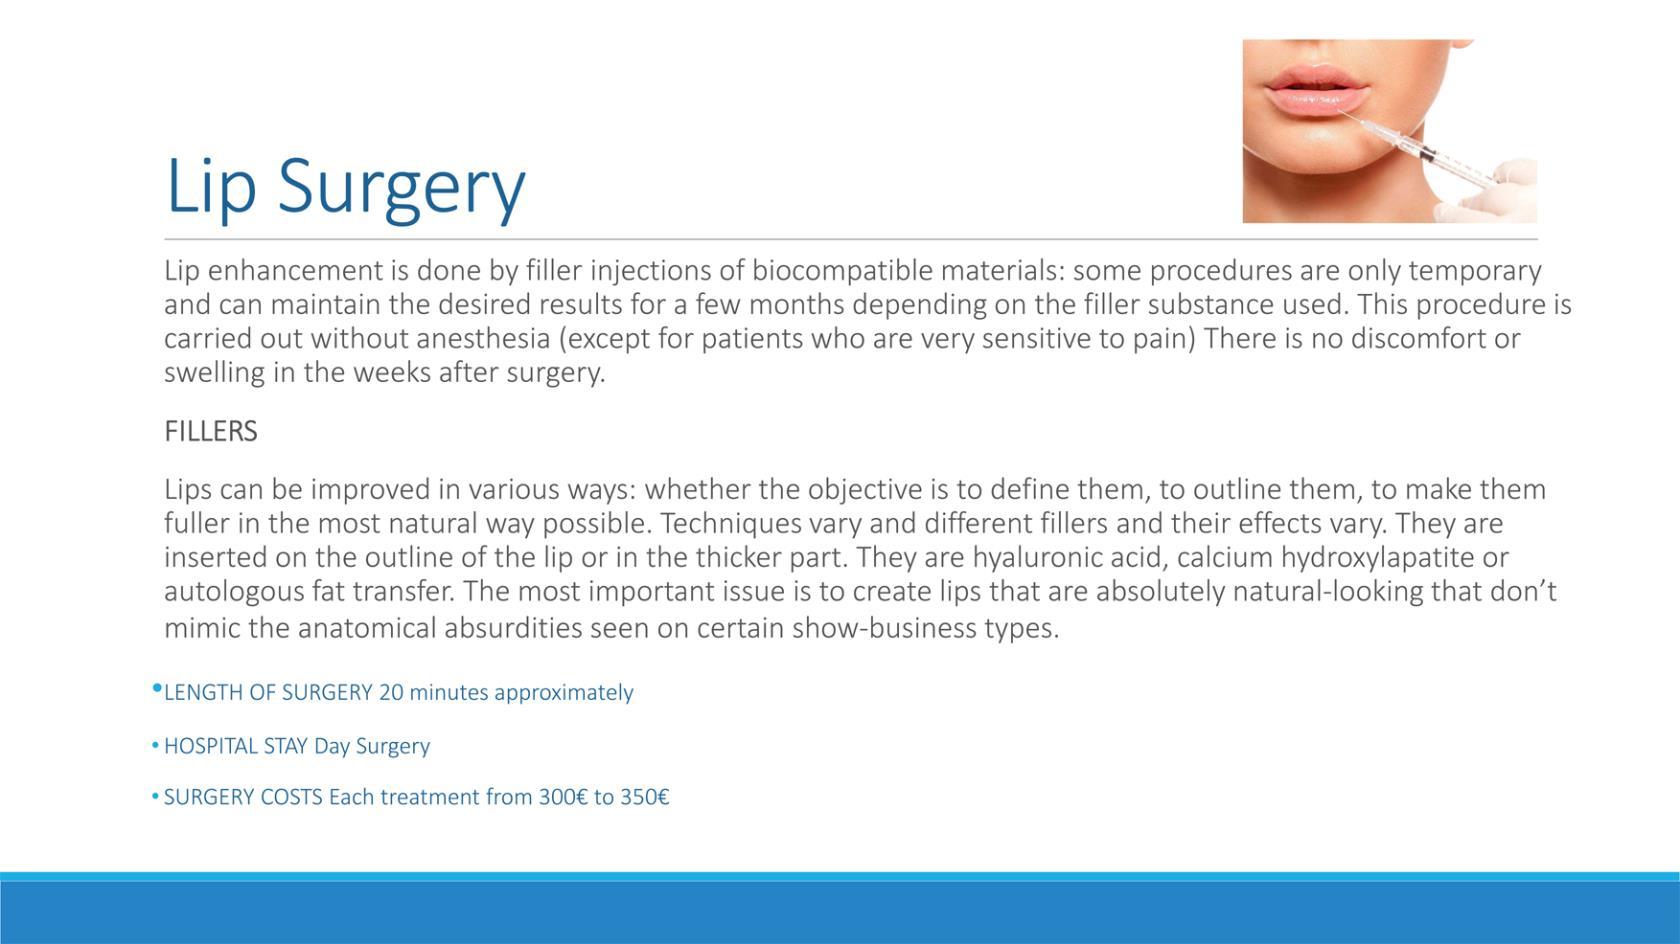 Chirurgia Labbra a Taranto